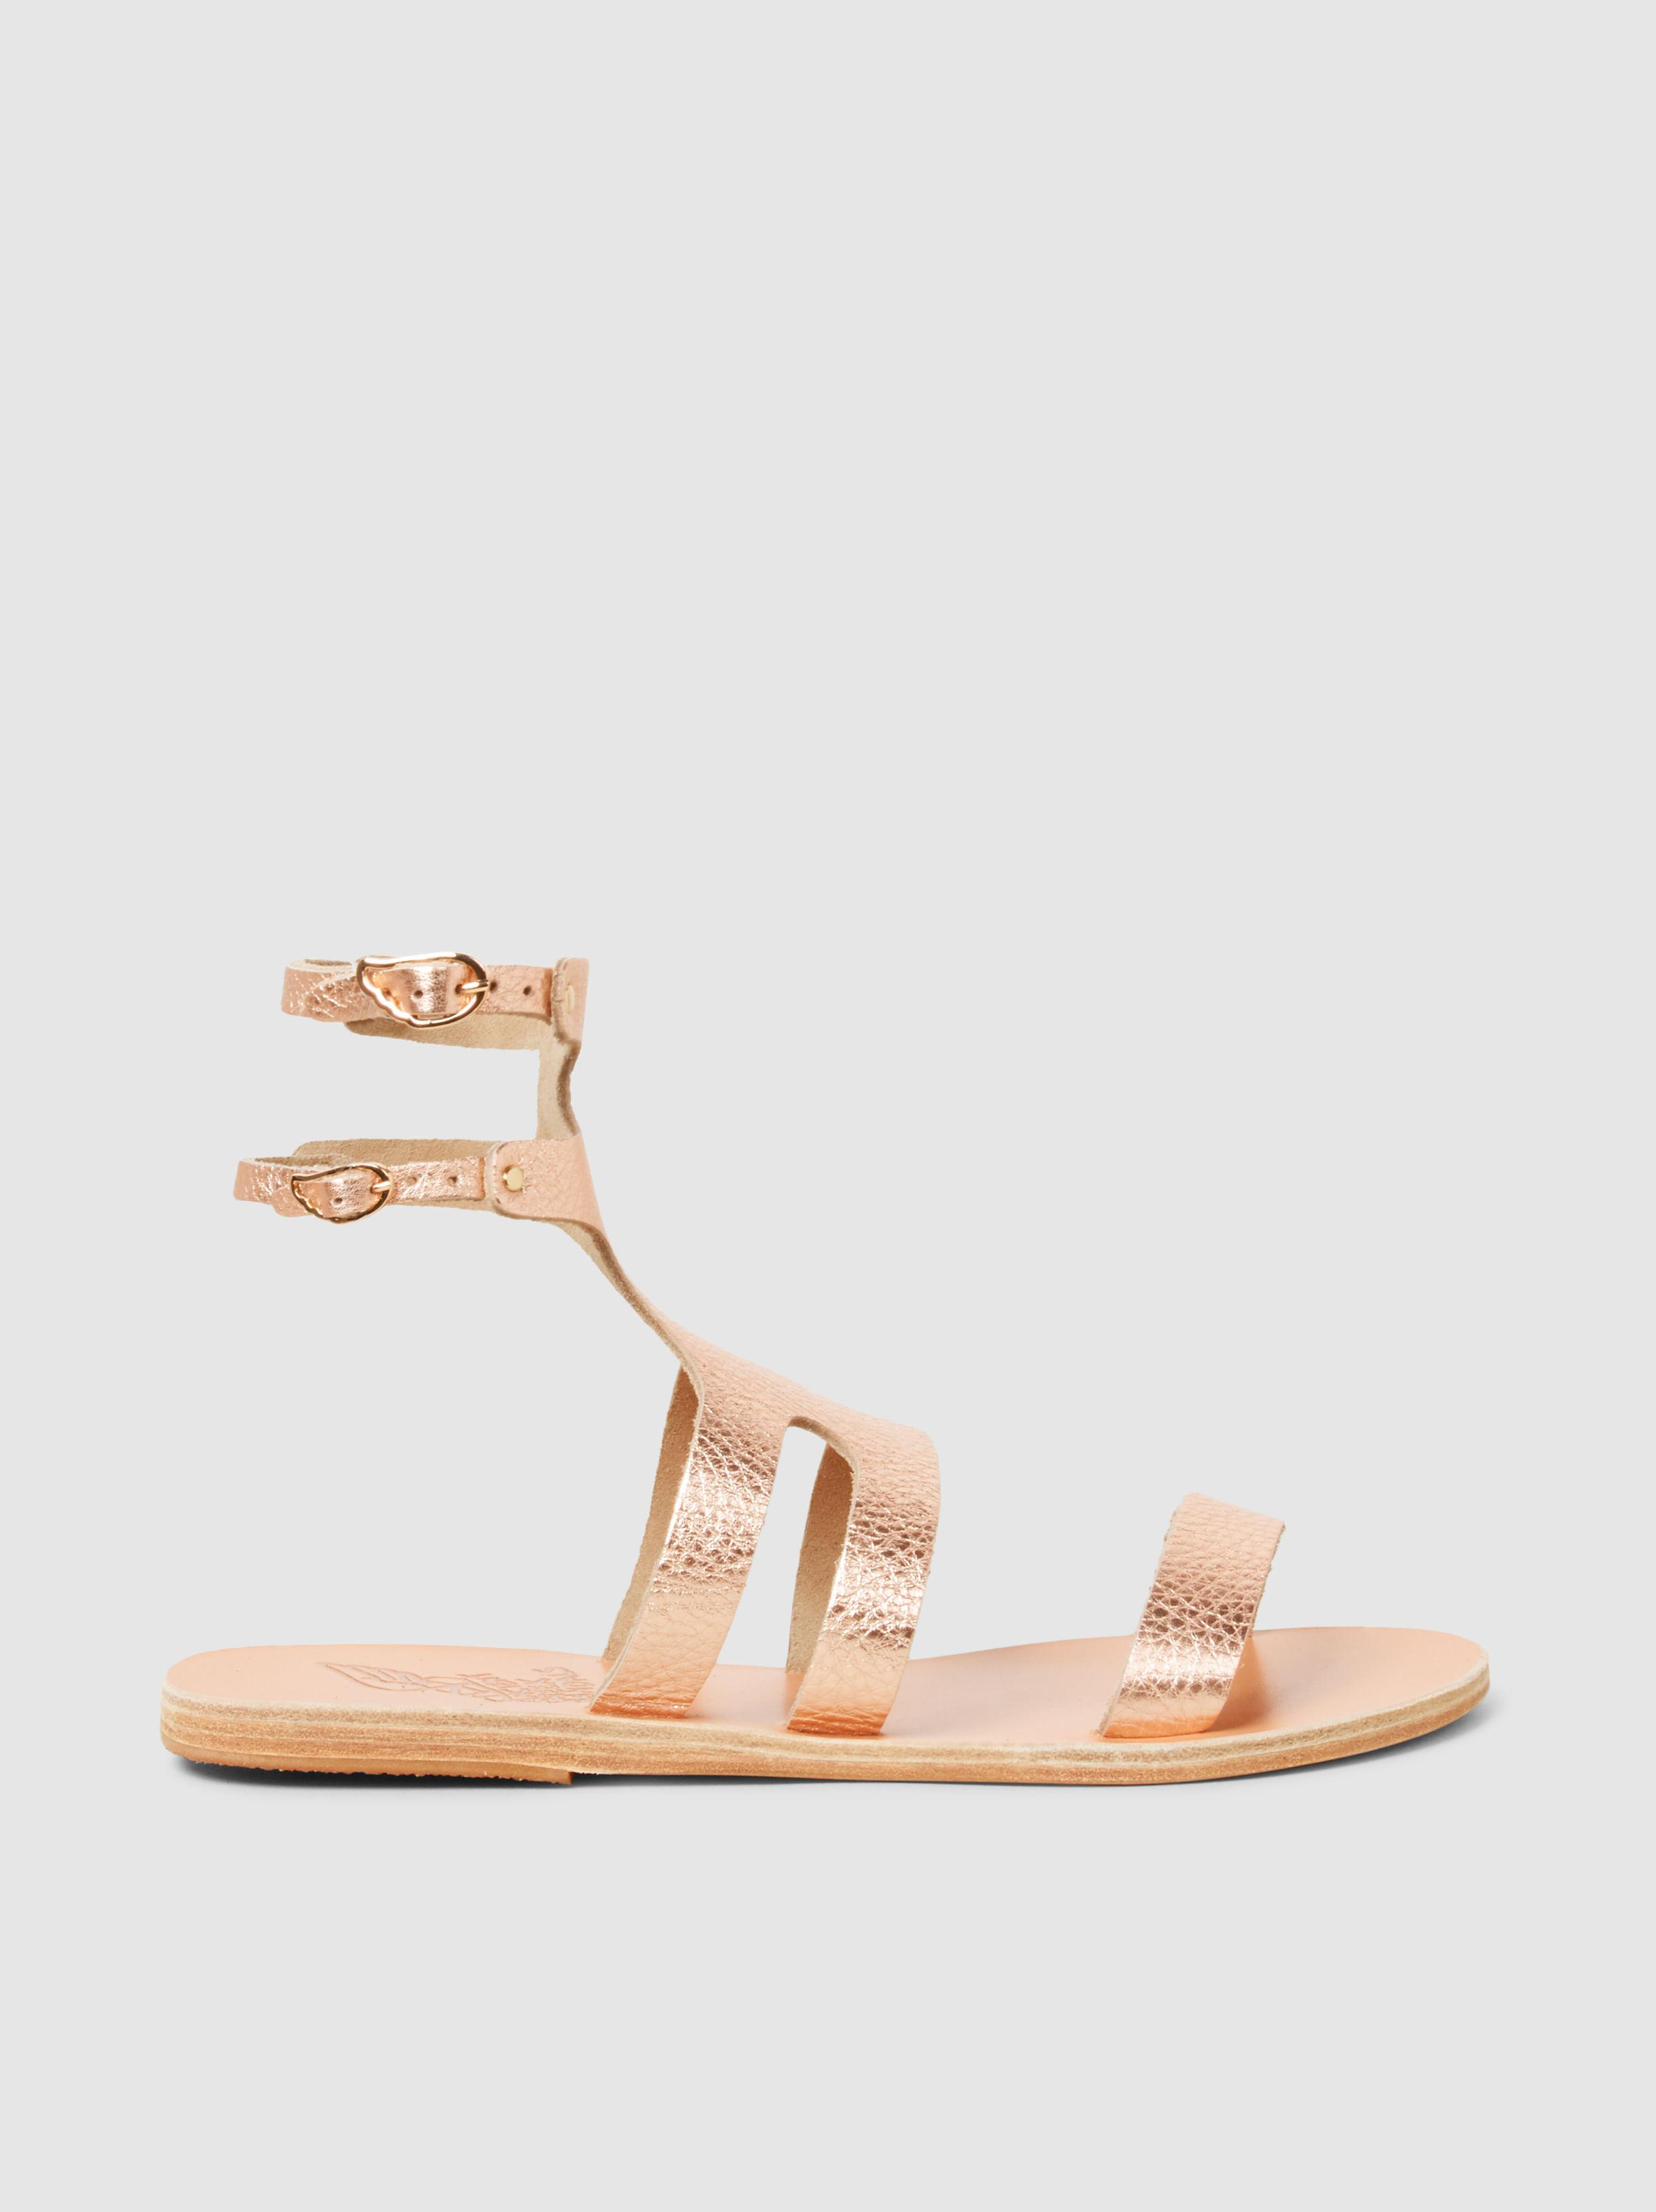 Apteros Metallic Crosta Leather Sandals Ancient Greek Sandals Cheap Sale Shop For y1JX8FVsLo